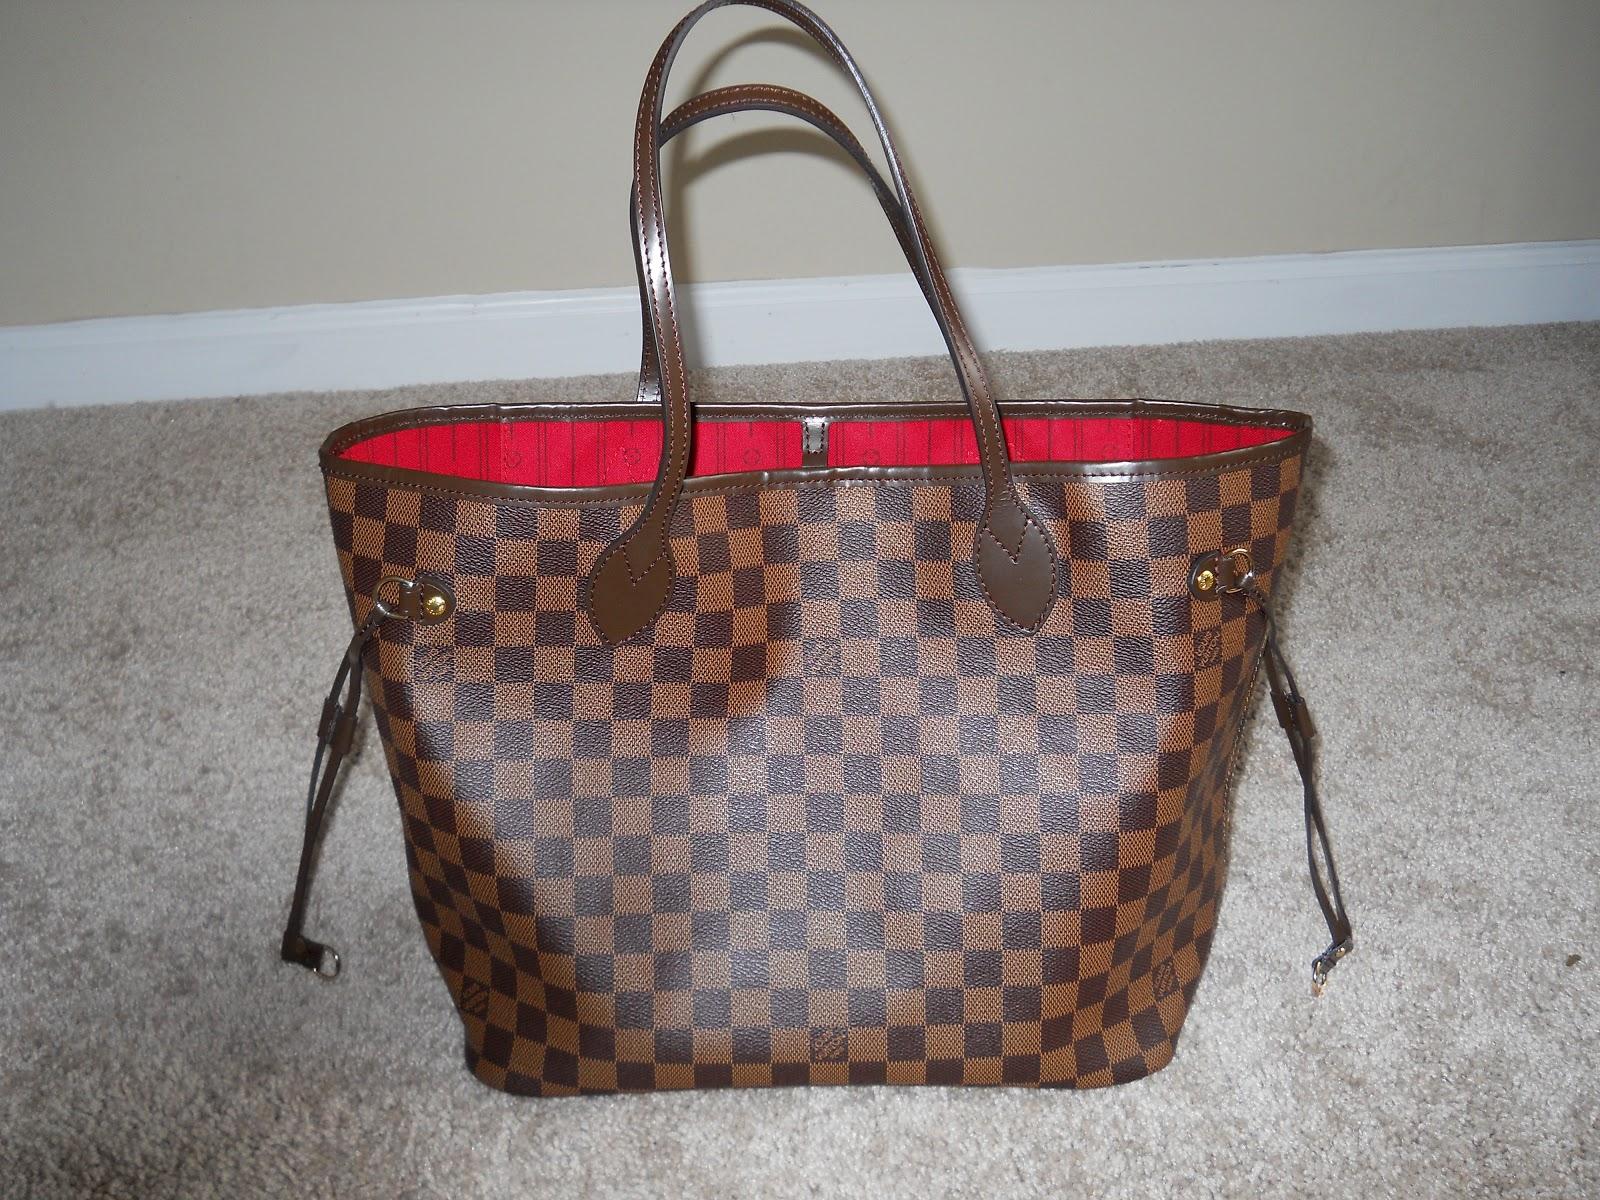 3cab5912f66a Louis Vuitton Neverfull Damier Azur Fake